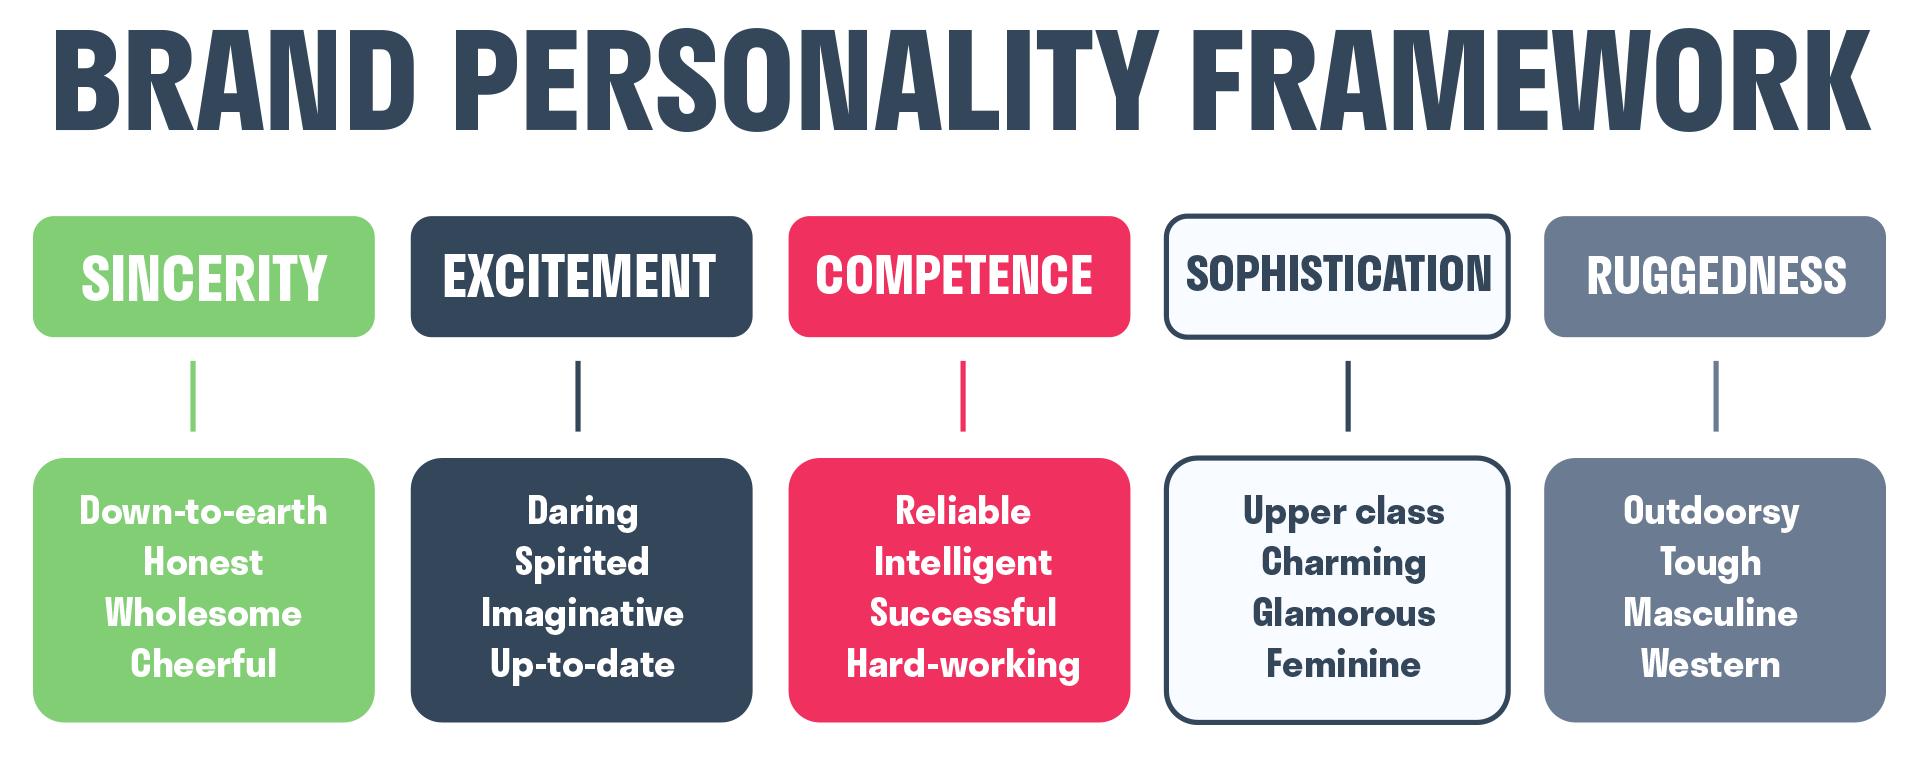 brand_personality_framework